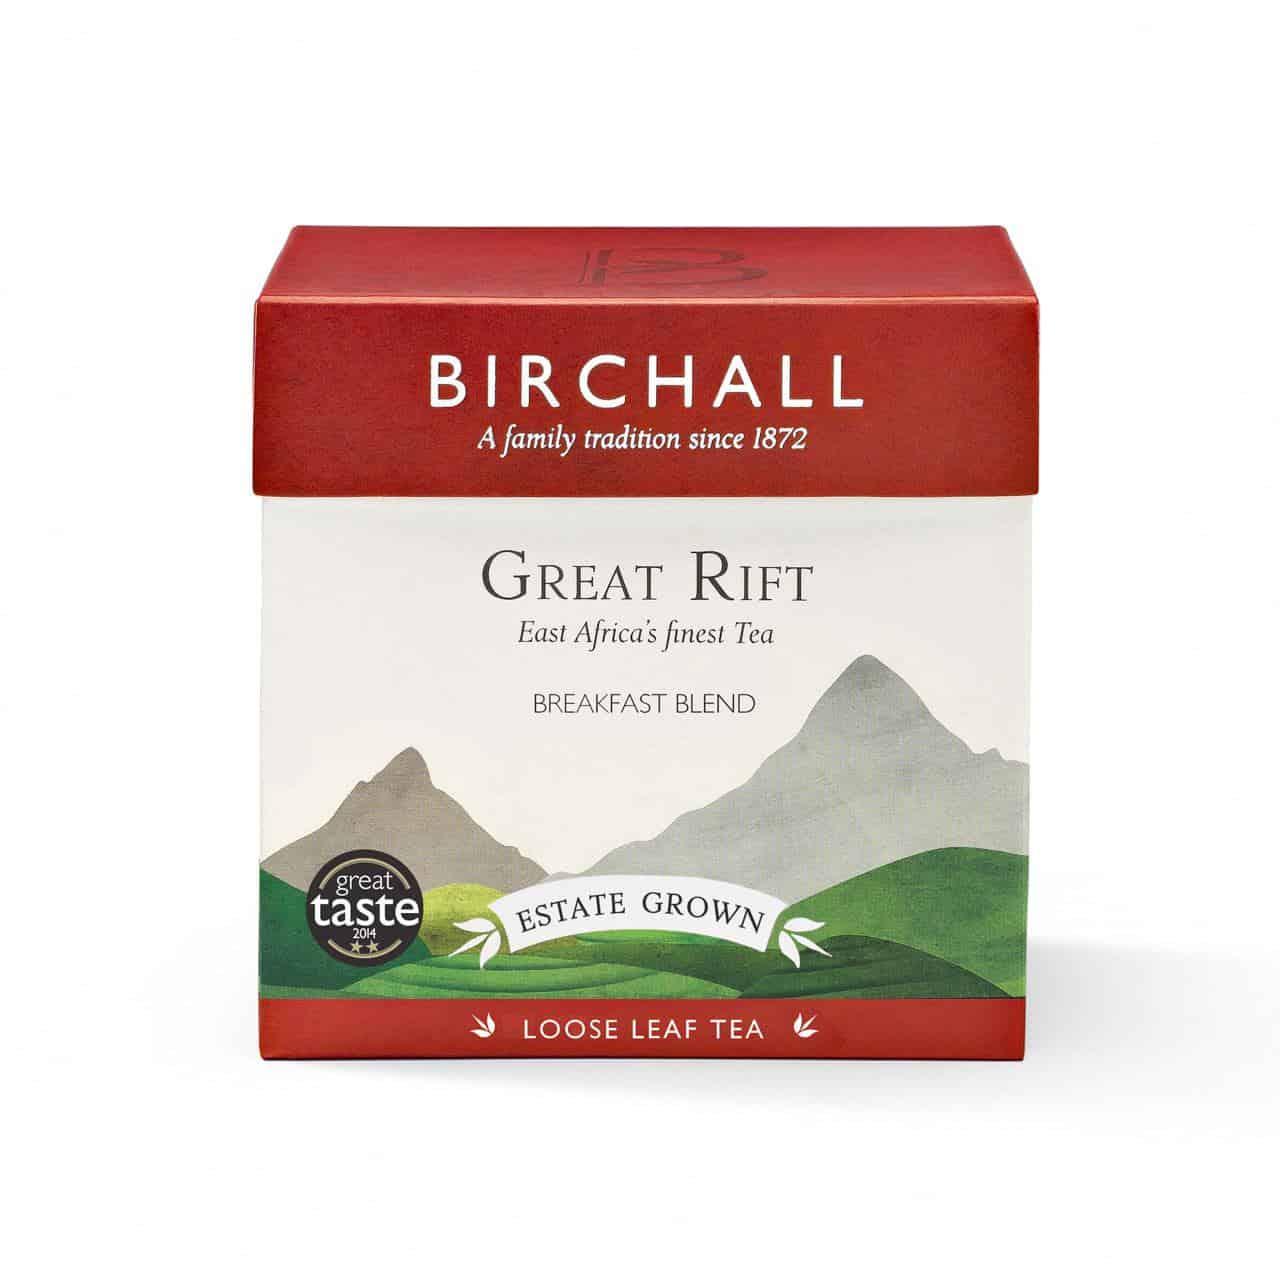 Birchall Great Rift Breakfast Blend - Loose Leaf Tea